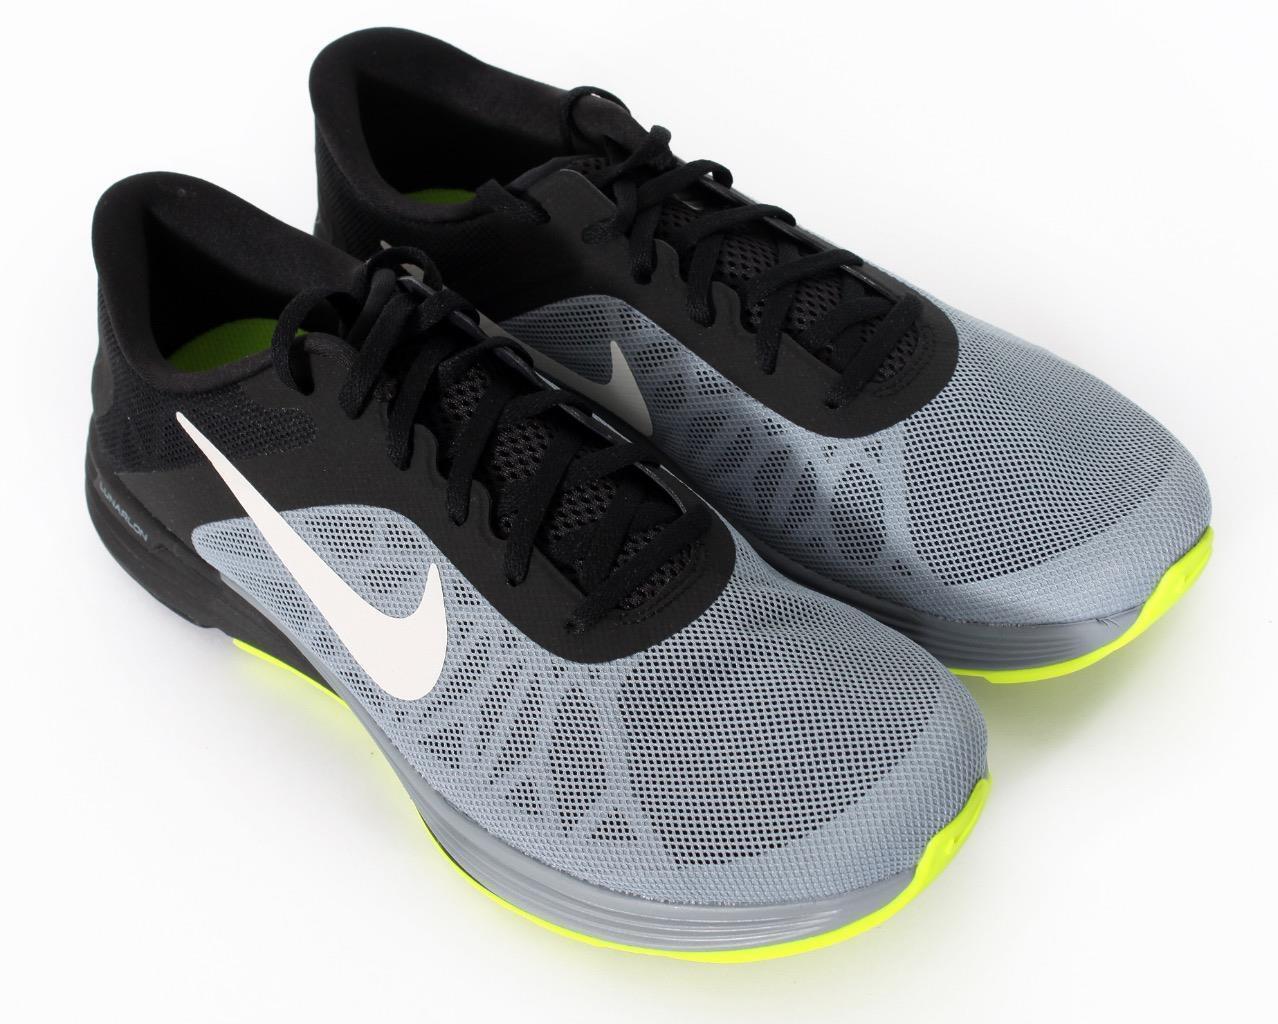 Nike lunarlaunch uomo scarpe da uomo lunarlaunch 694915-001 pennino autentico. fdb591